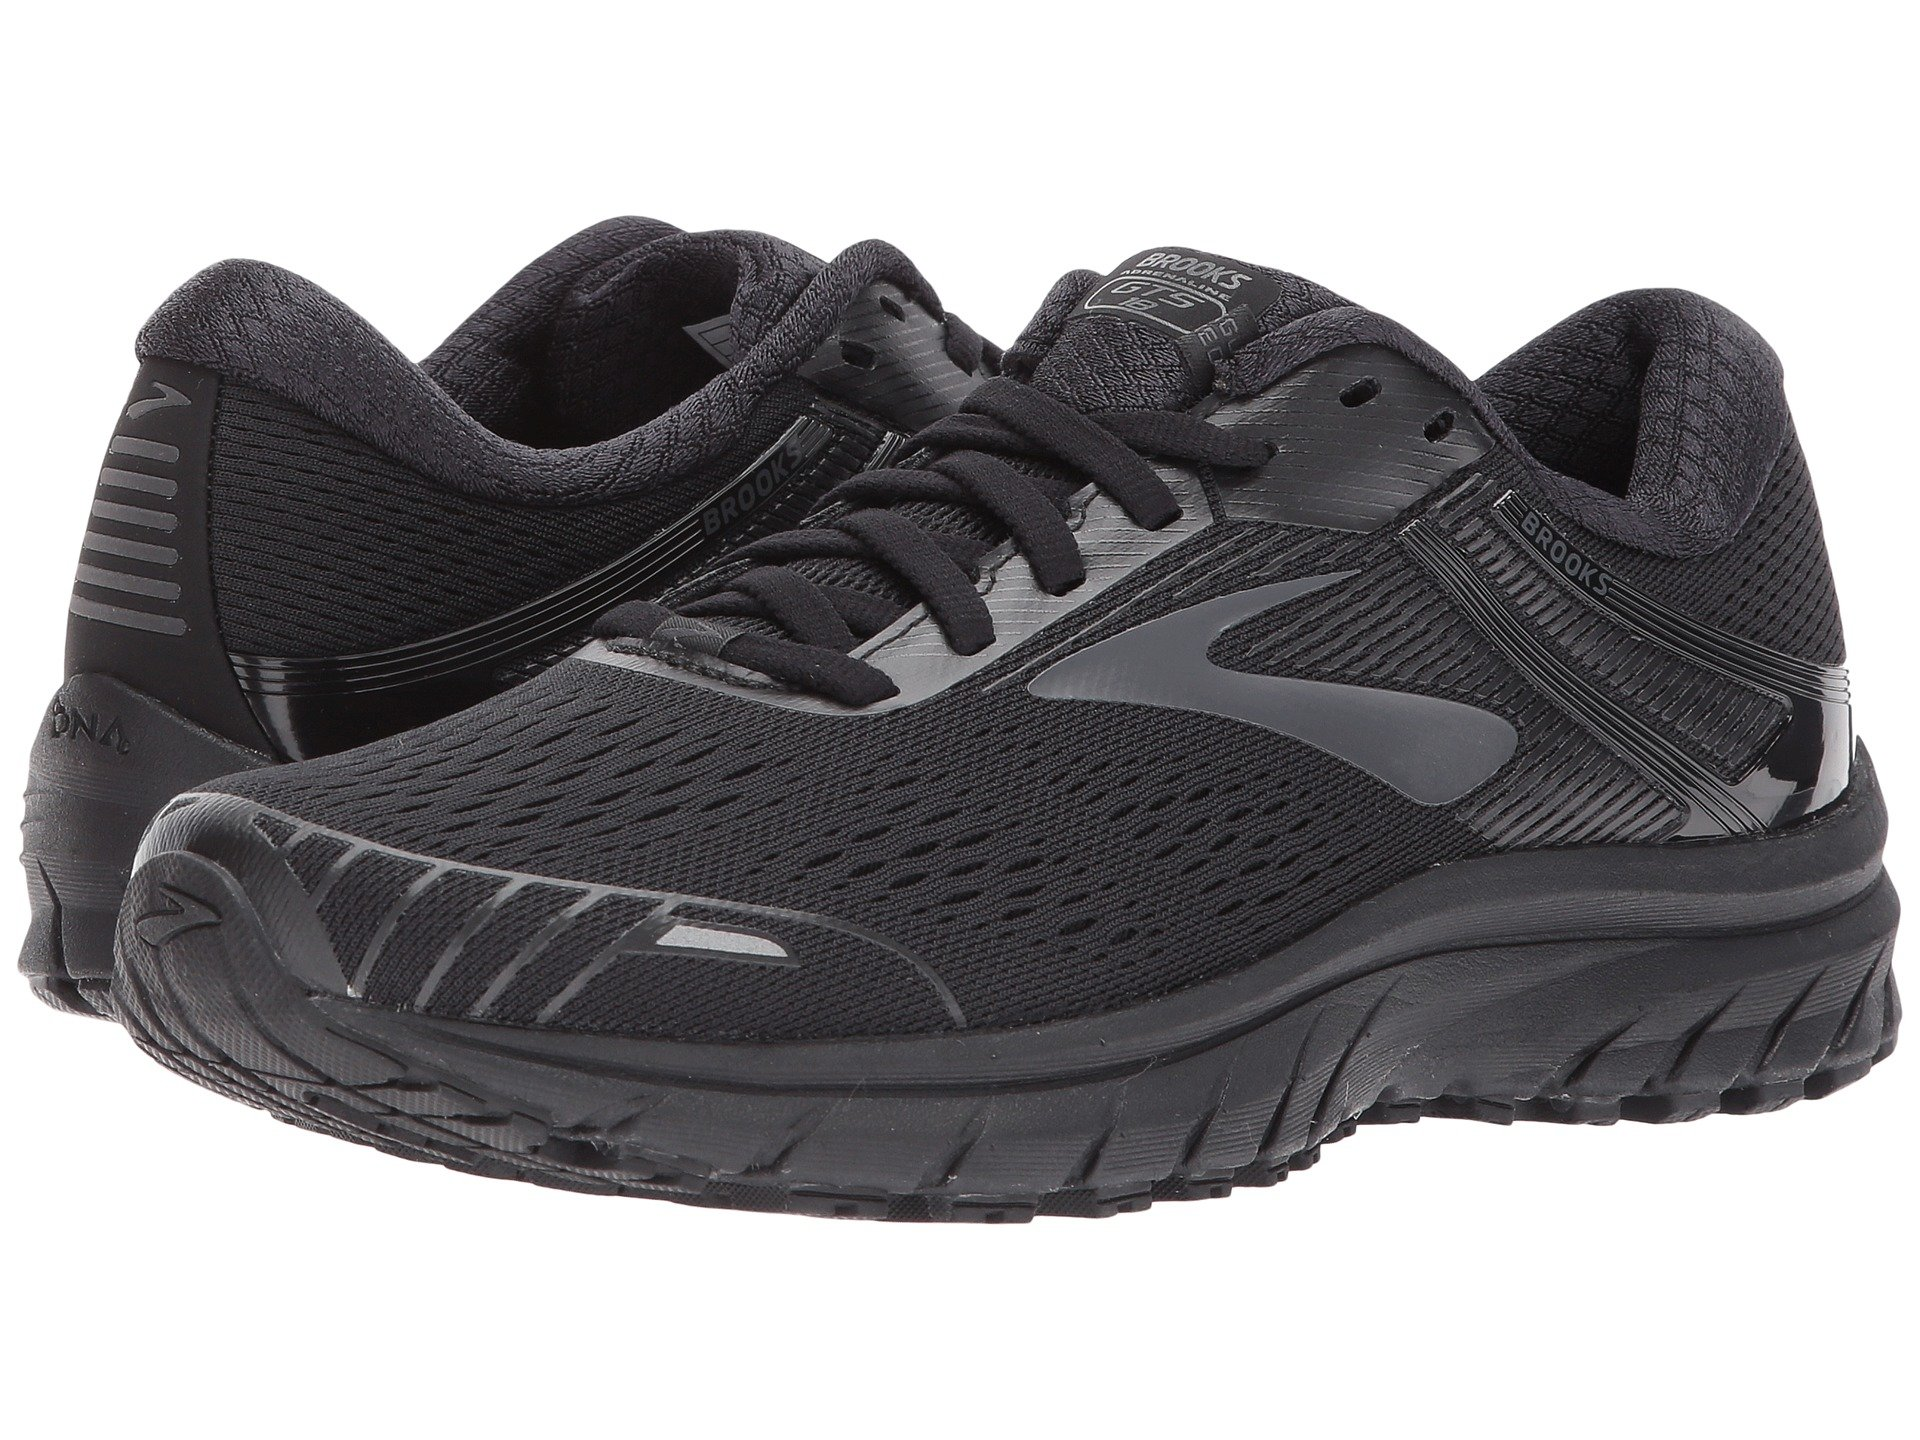 Brooks Adrenaline Running Shoes Amazon